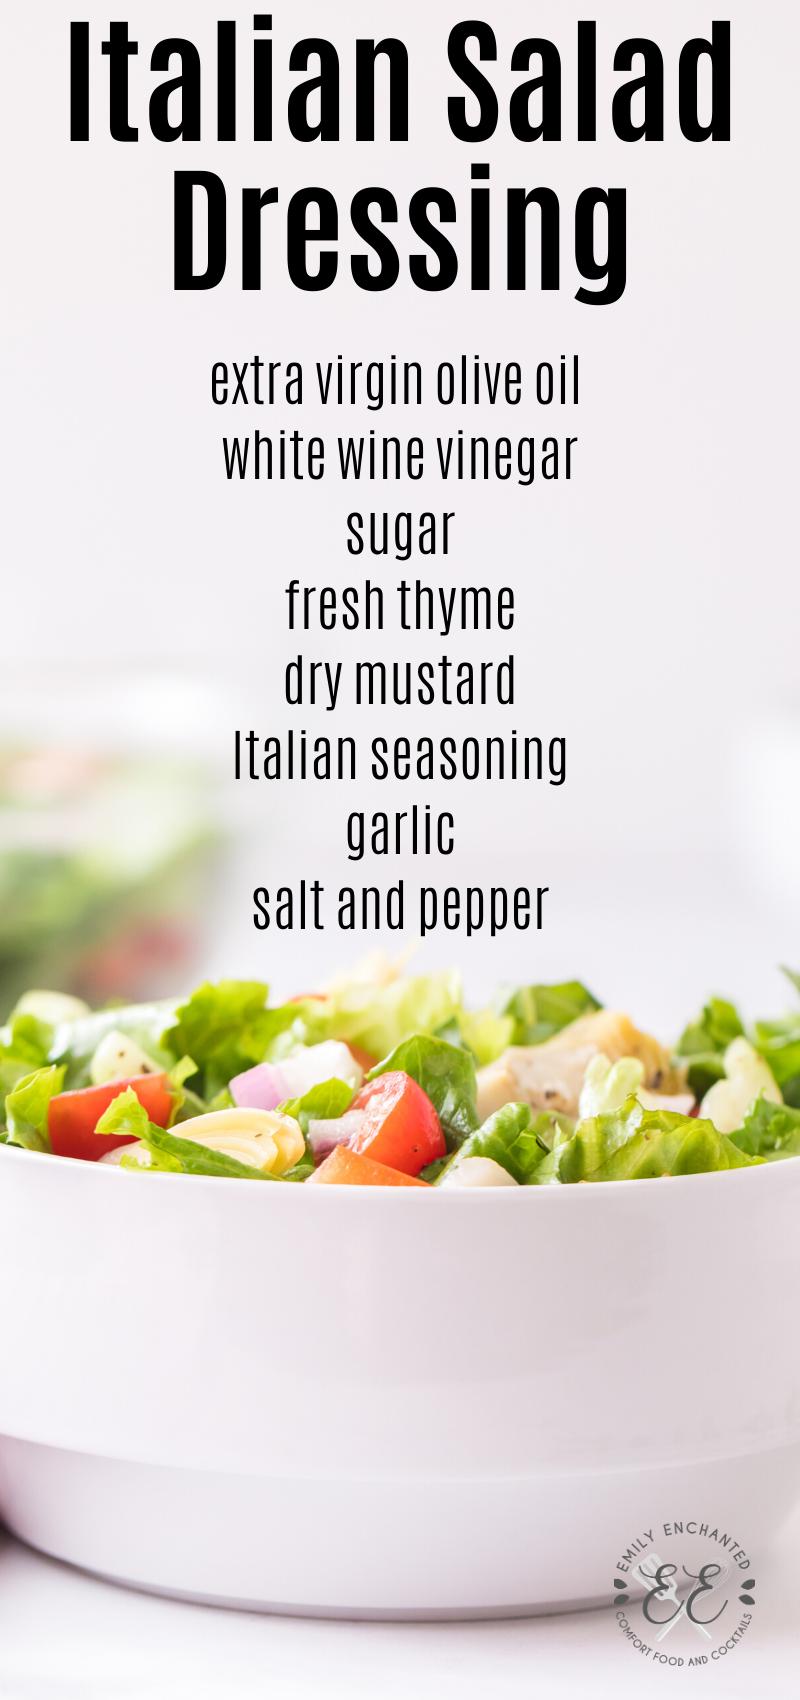 Zesty Italian Salad Dressing Sweet Italian Dressing Recipe Italian Salad Italian Salad Dressing [ 1700 x 800 Pixel ]